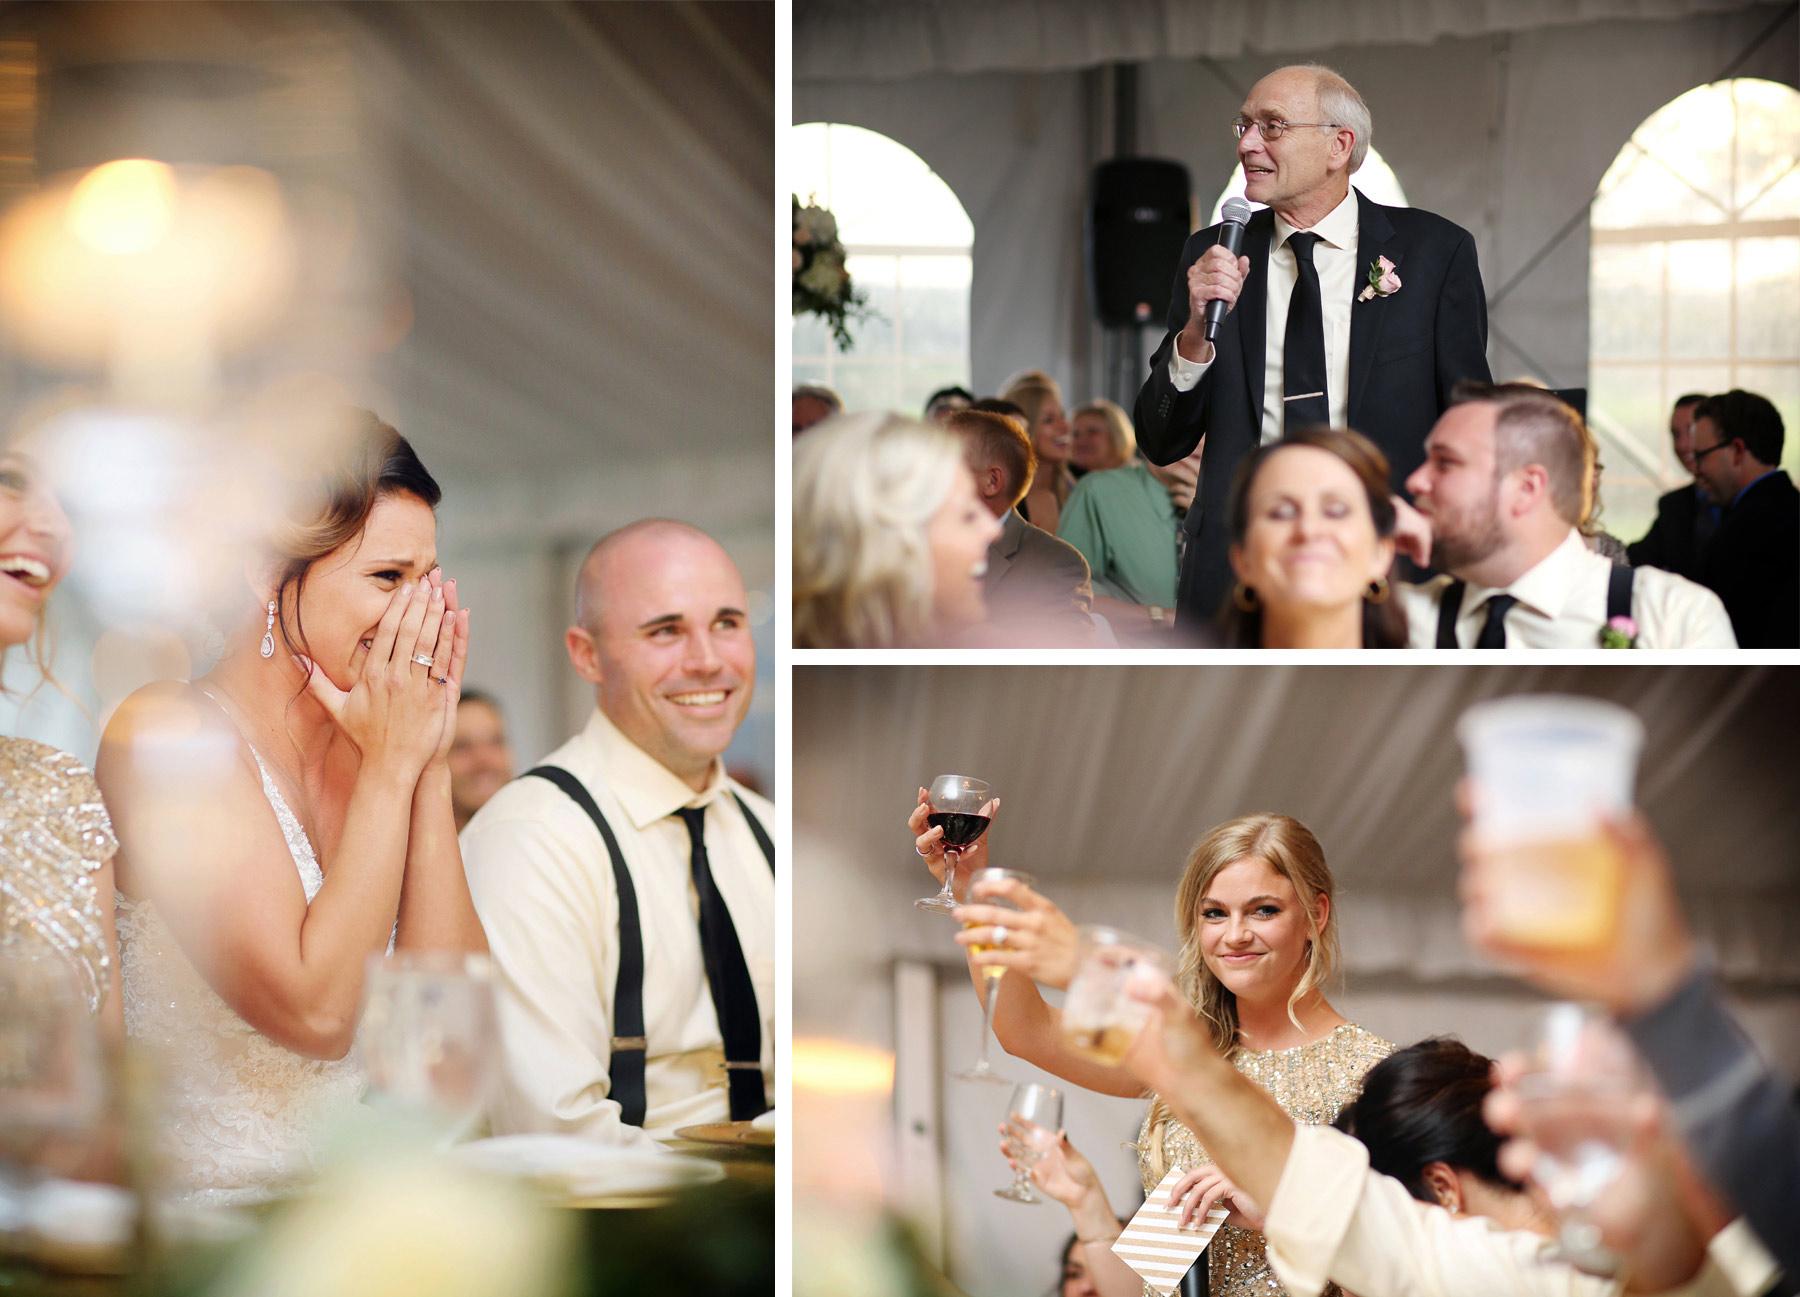 19-Stillwater-Minnesota-Wedding-Photography-by-Vick-Photography-Stone-Ridge-Golf-Club-Reception-Tara-&-Ryan.jpg